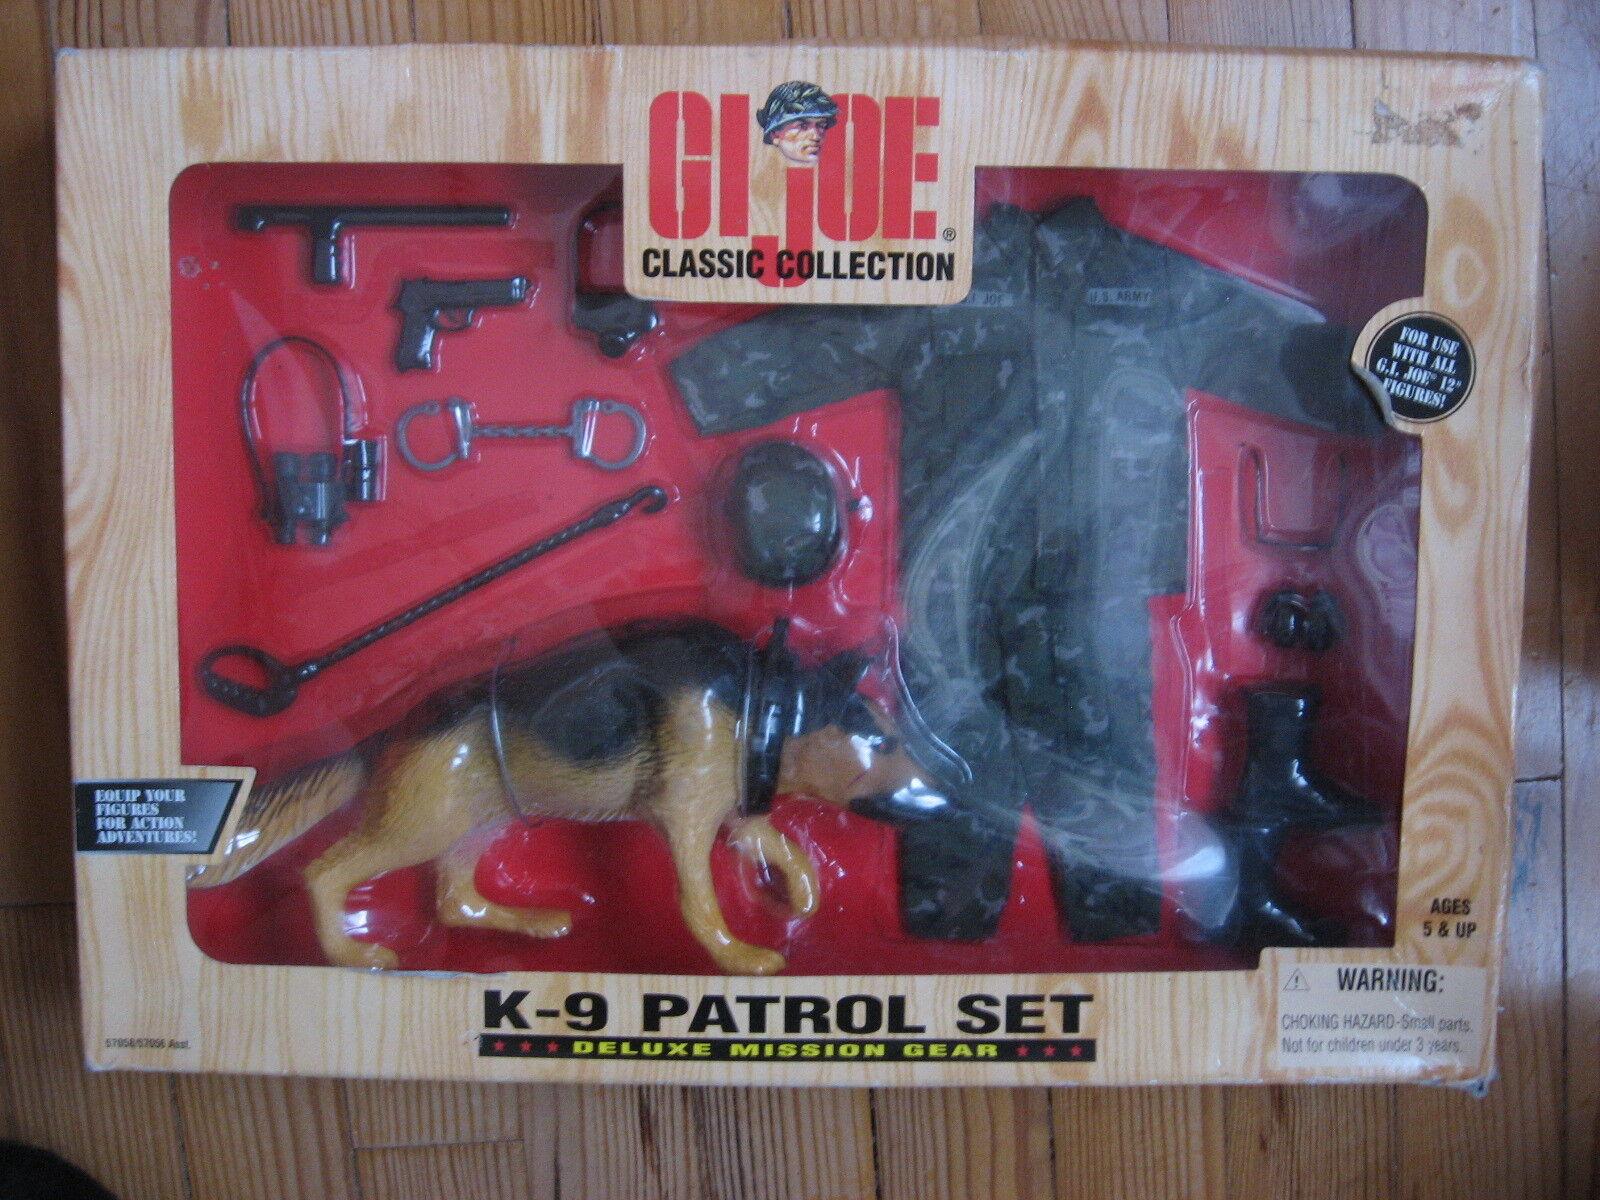 1 6 PANOPLY GI JOE MAN 1979 ACTION K-9 PATROL SET